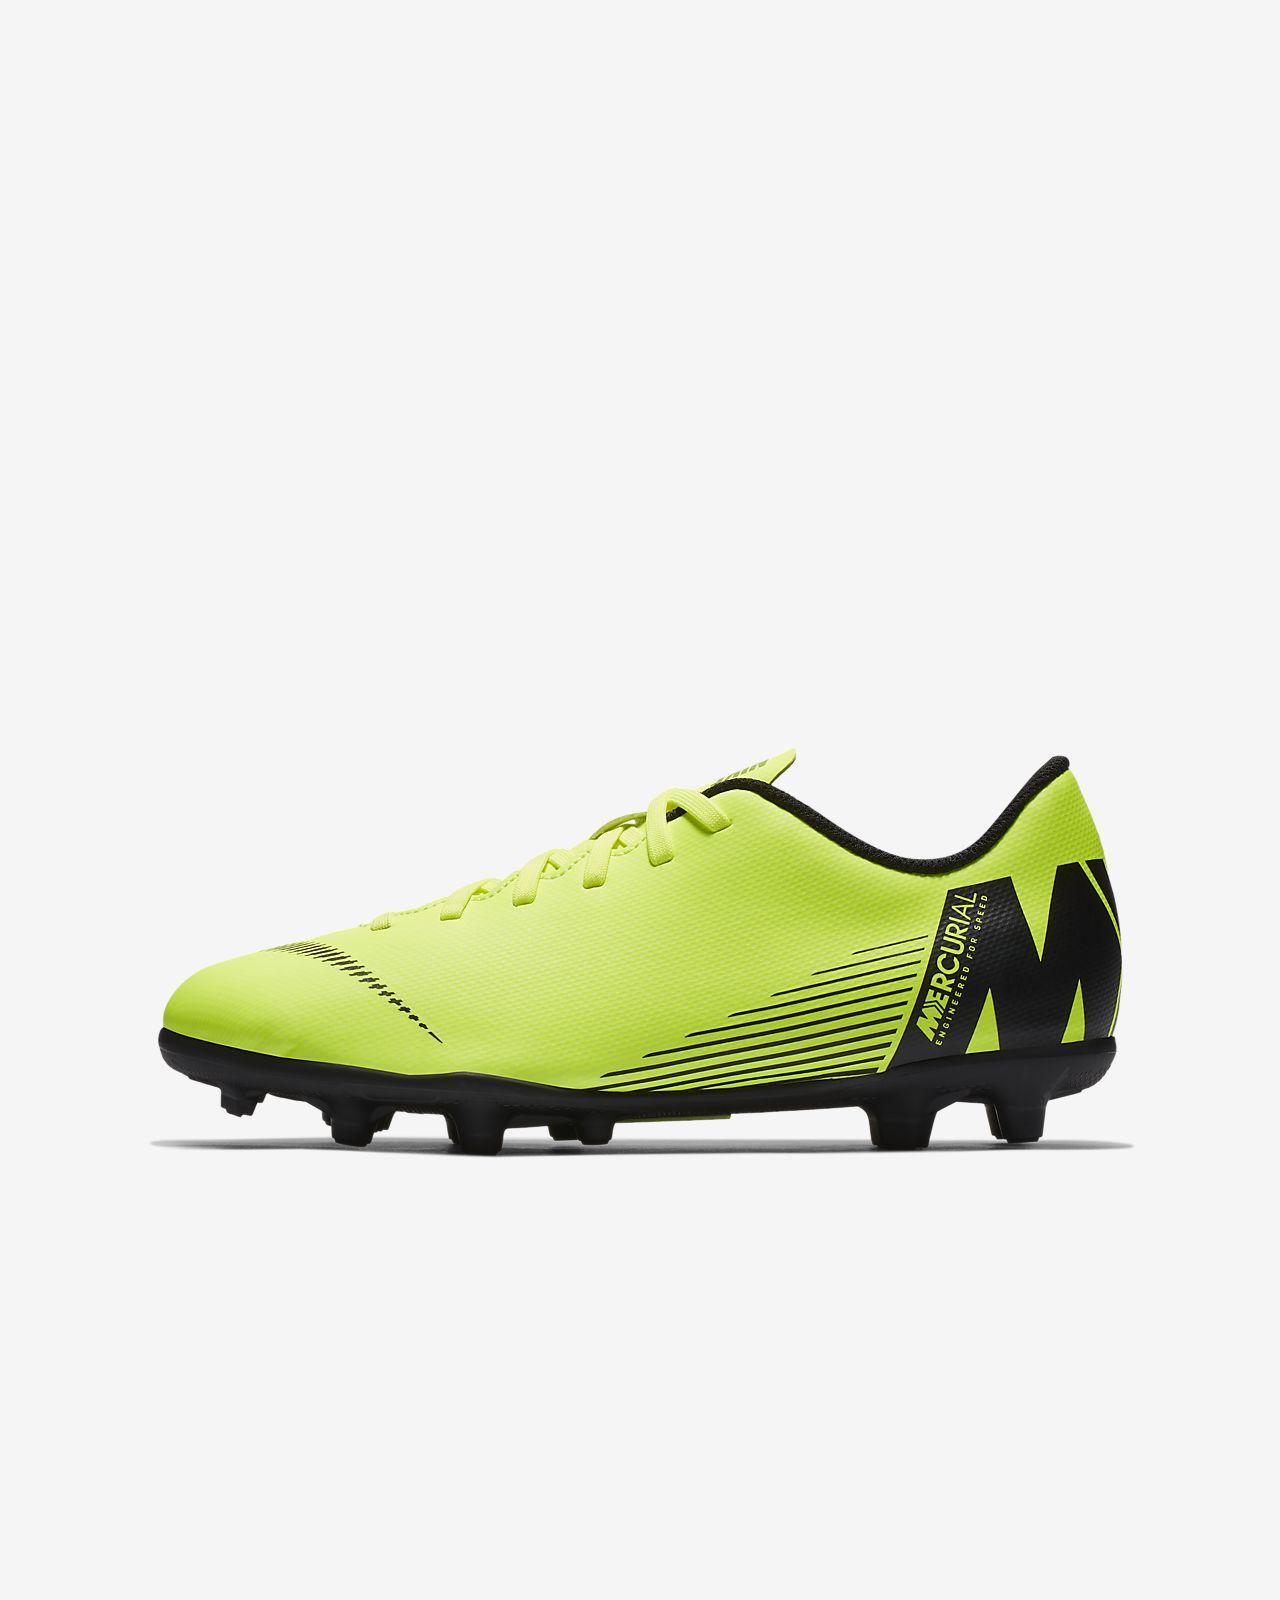 ... Calzado de fútbol para múltiples superficies para niños talla grande Nike  Jr. Vapor 12 Club 06c0229291dd4